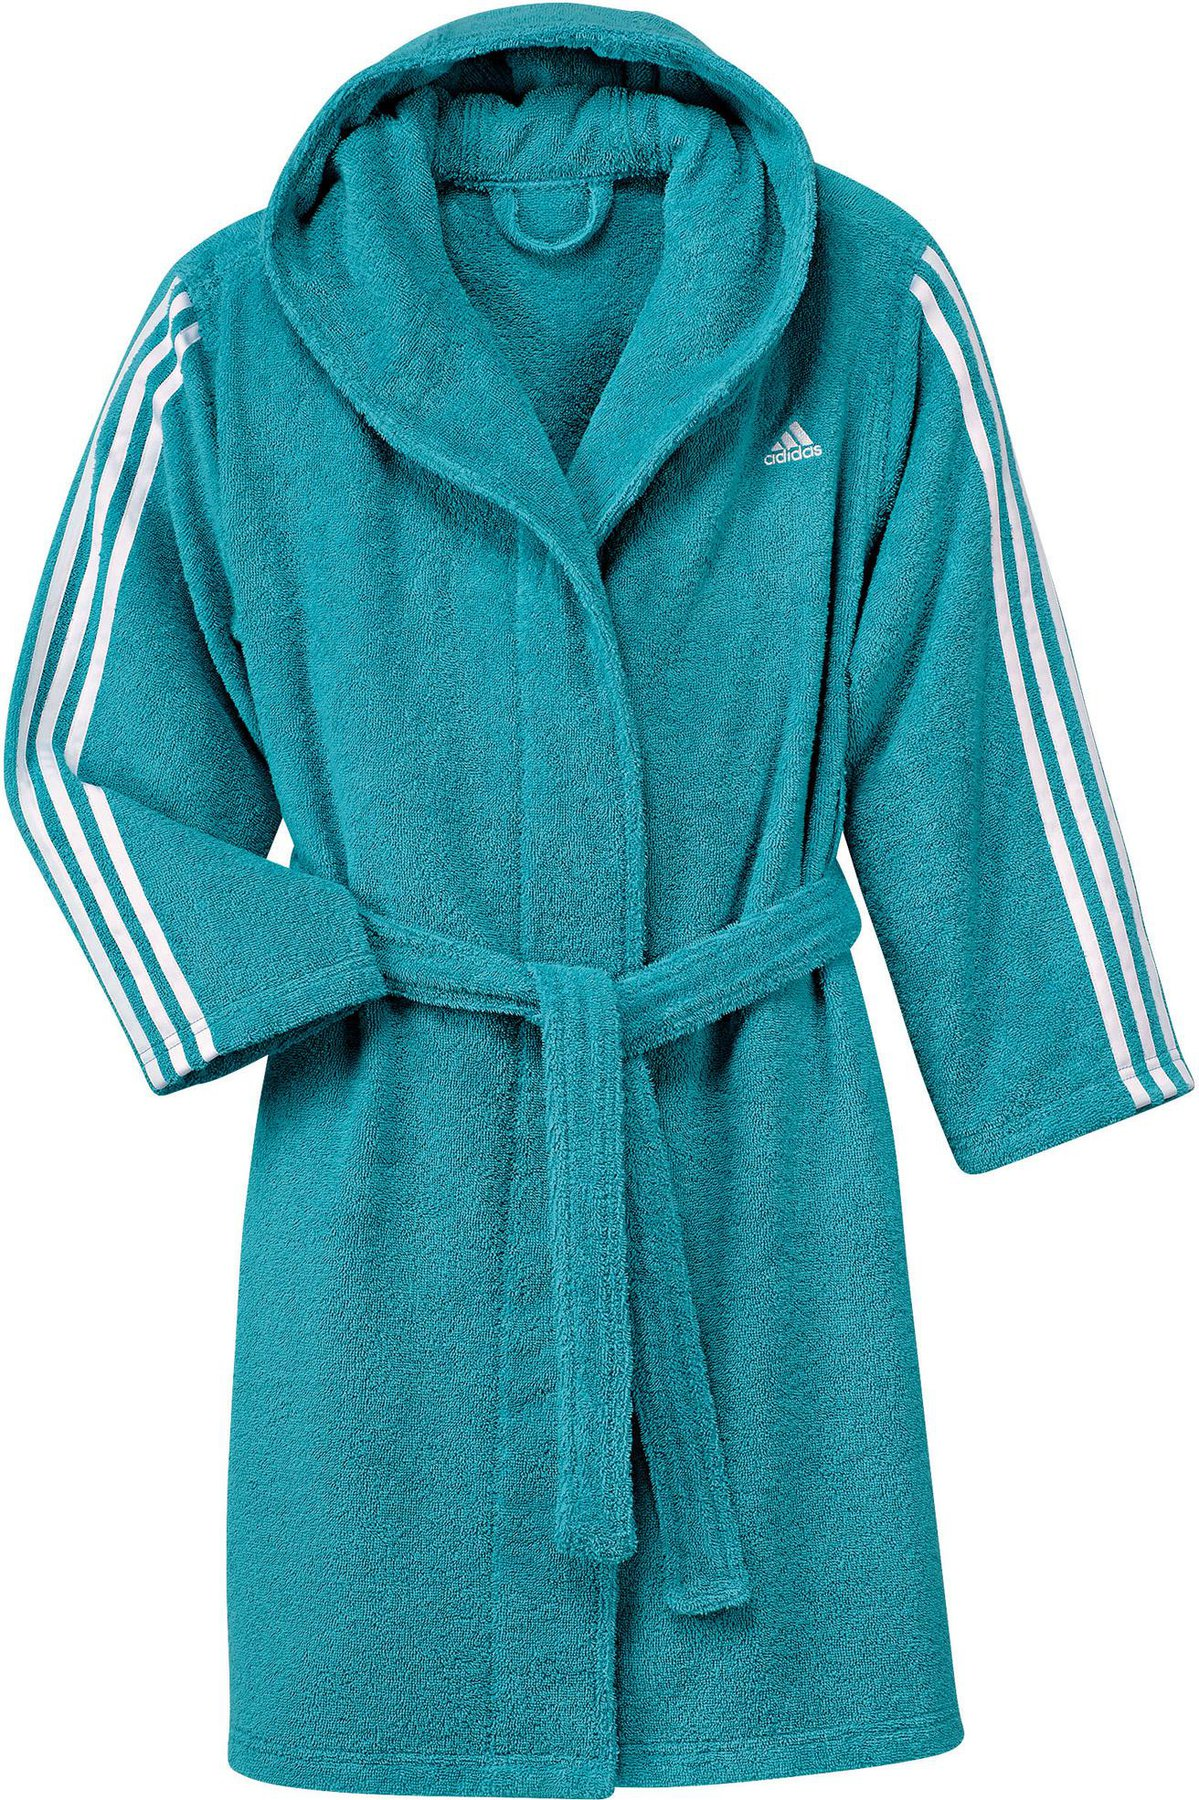 Factory Outlets neue Sachen Laufschuhe Adidas 3 Stripes Kinder-Bademantel